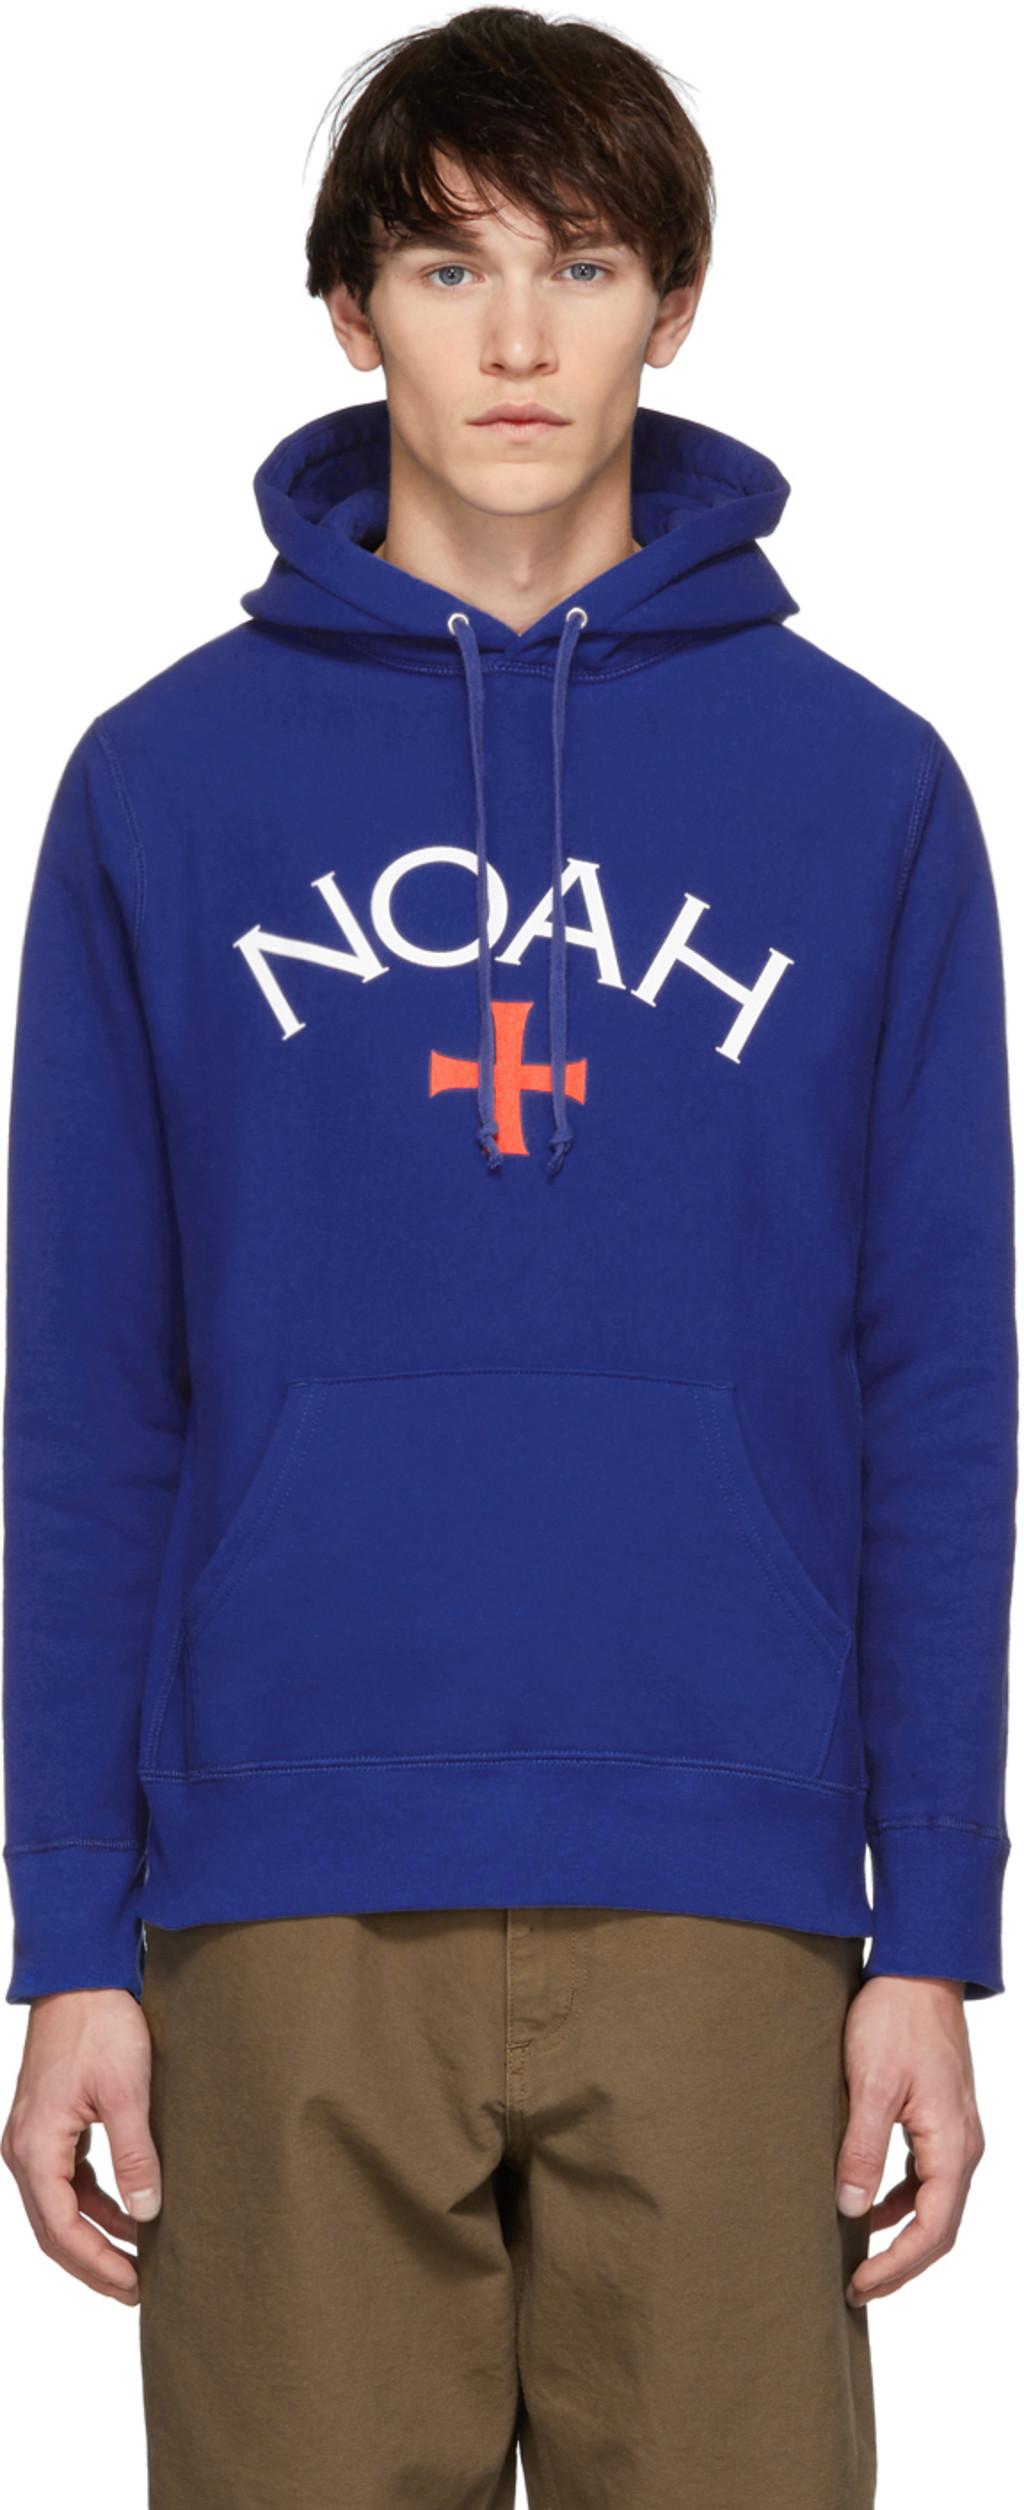 ca3160e9fb7 Noah Nyc for Men SS19 Collection